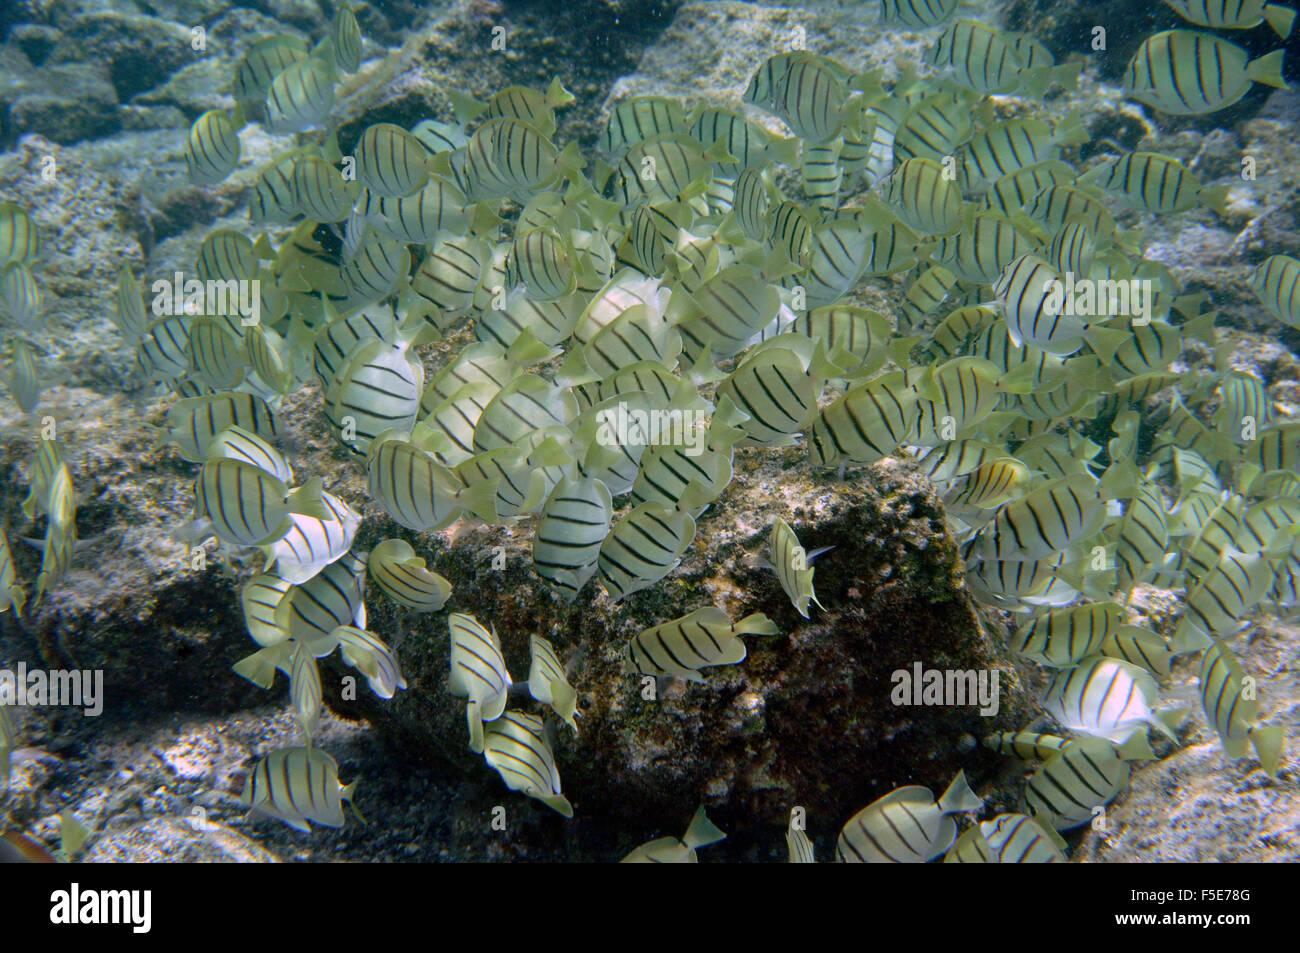 Aggregation of convict tang or manini, Acanthurus triostegus, feeding on algae, Waiopae tide pools, Kapoho, Big - Stock Image